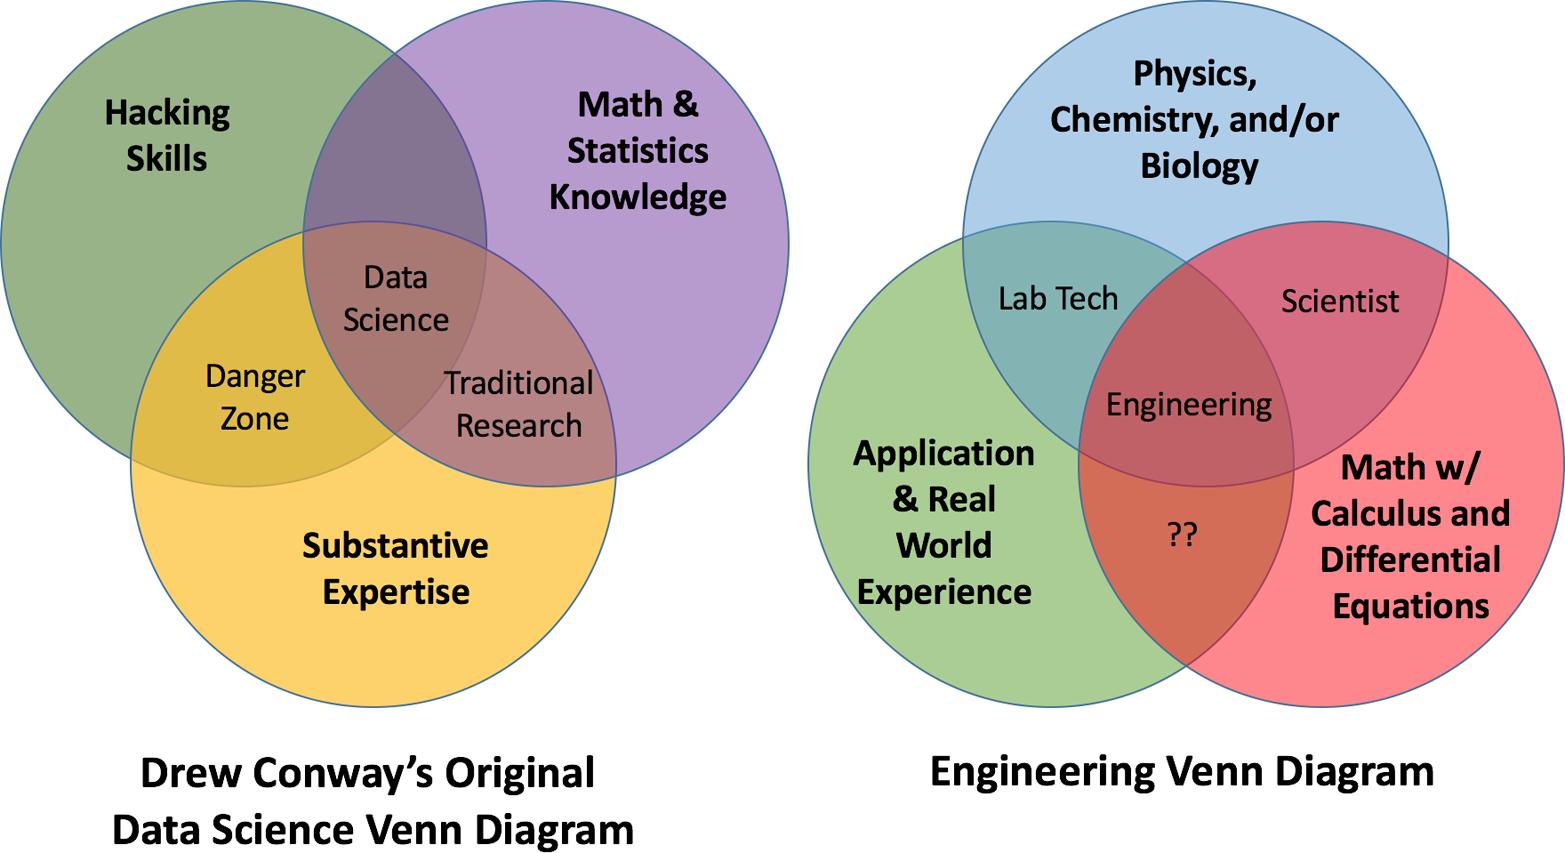 Drew Conway's original data science Venn diagram and what an general engineering Venn diagram might look like.